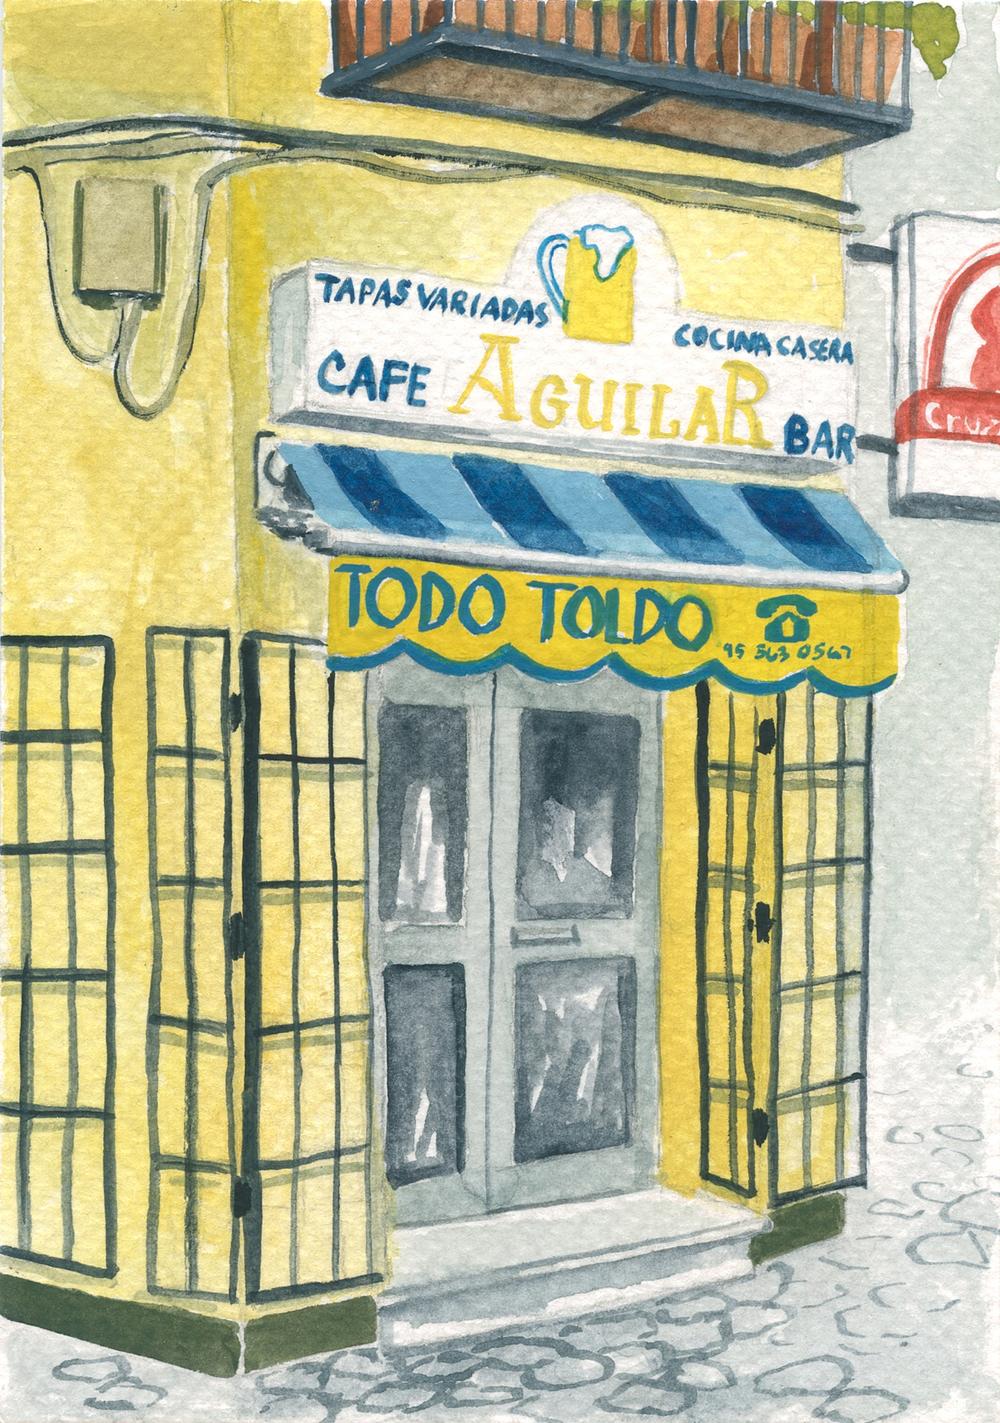 Cafe Aguilar